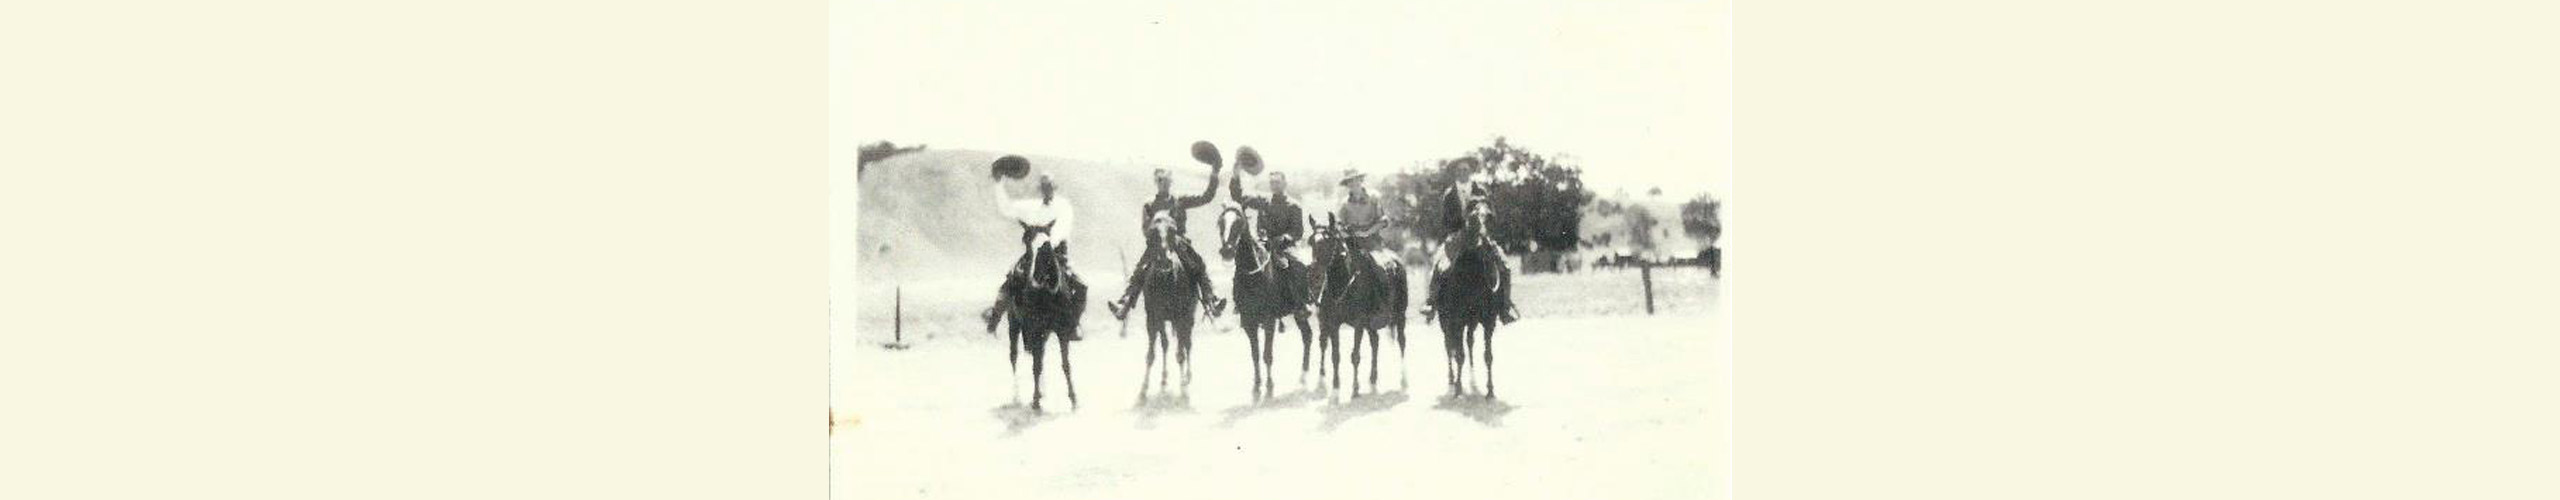 Parkfield_History_Cowboys